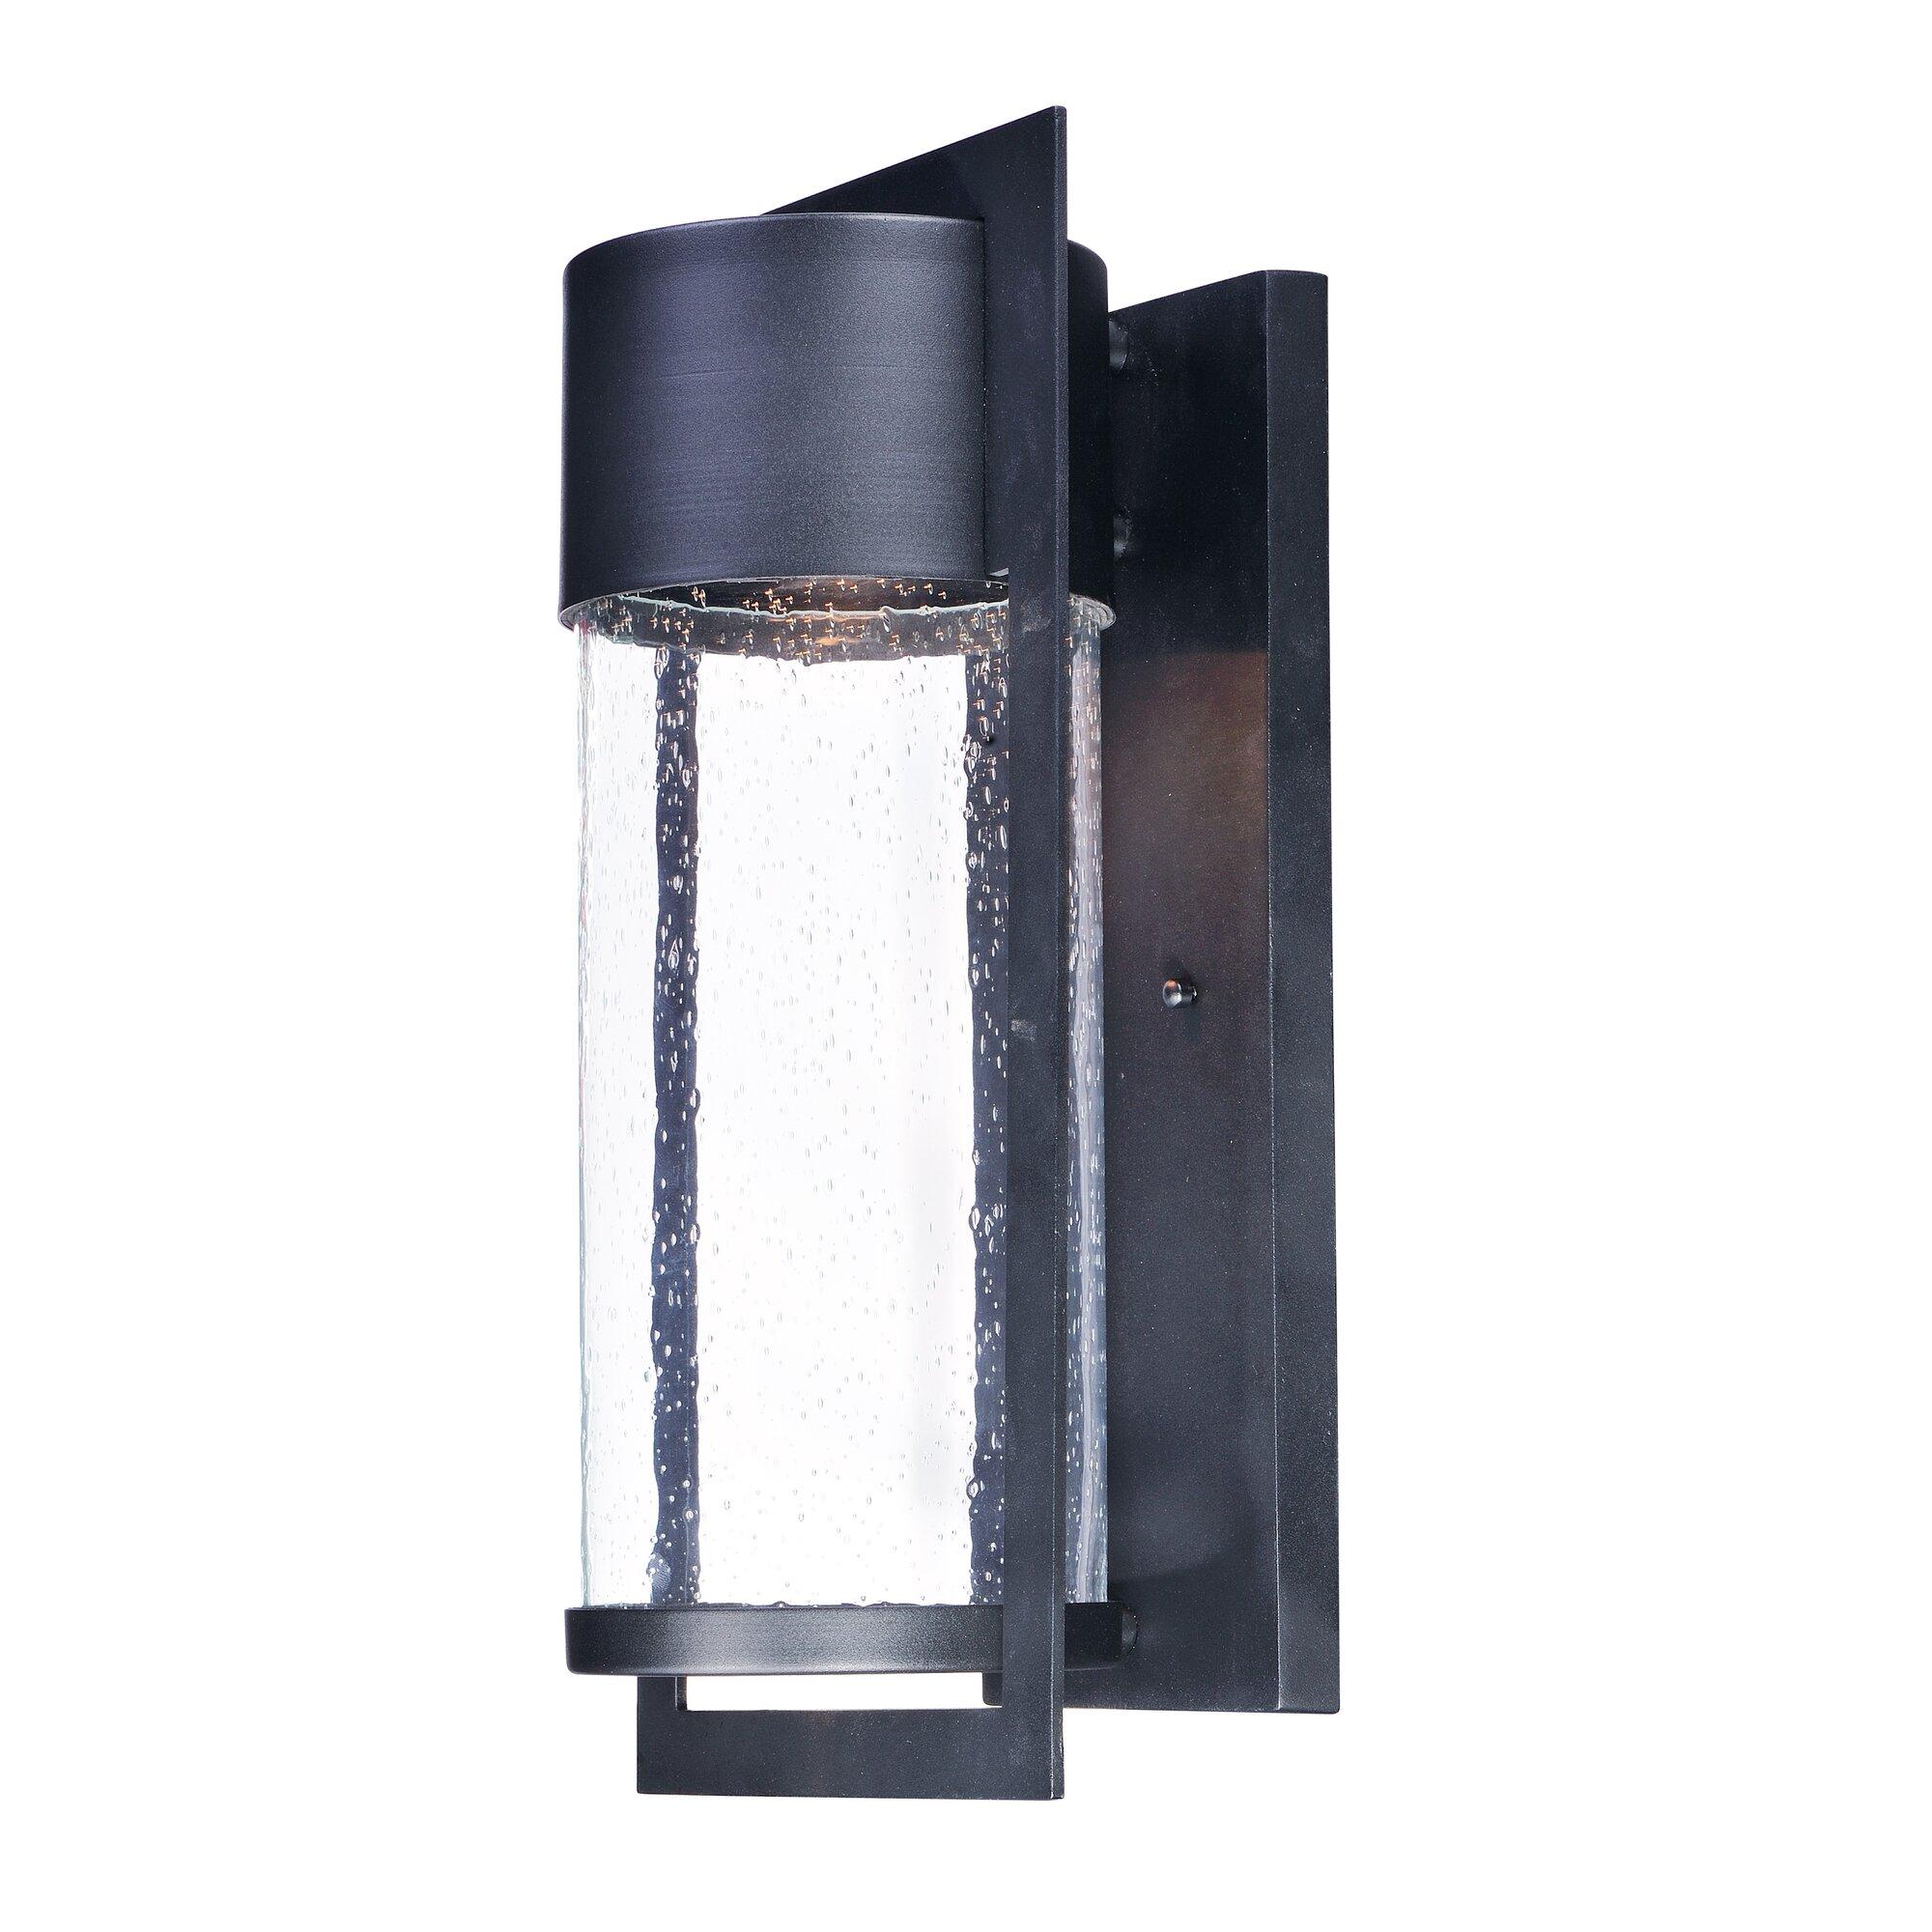 Flush mount outdoor lighting - Caulder 1 Light Outdoor Flush Mount